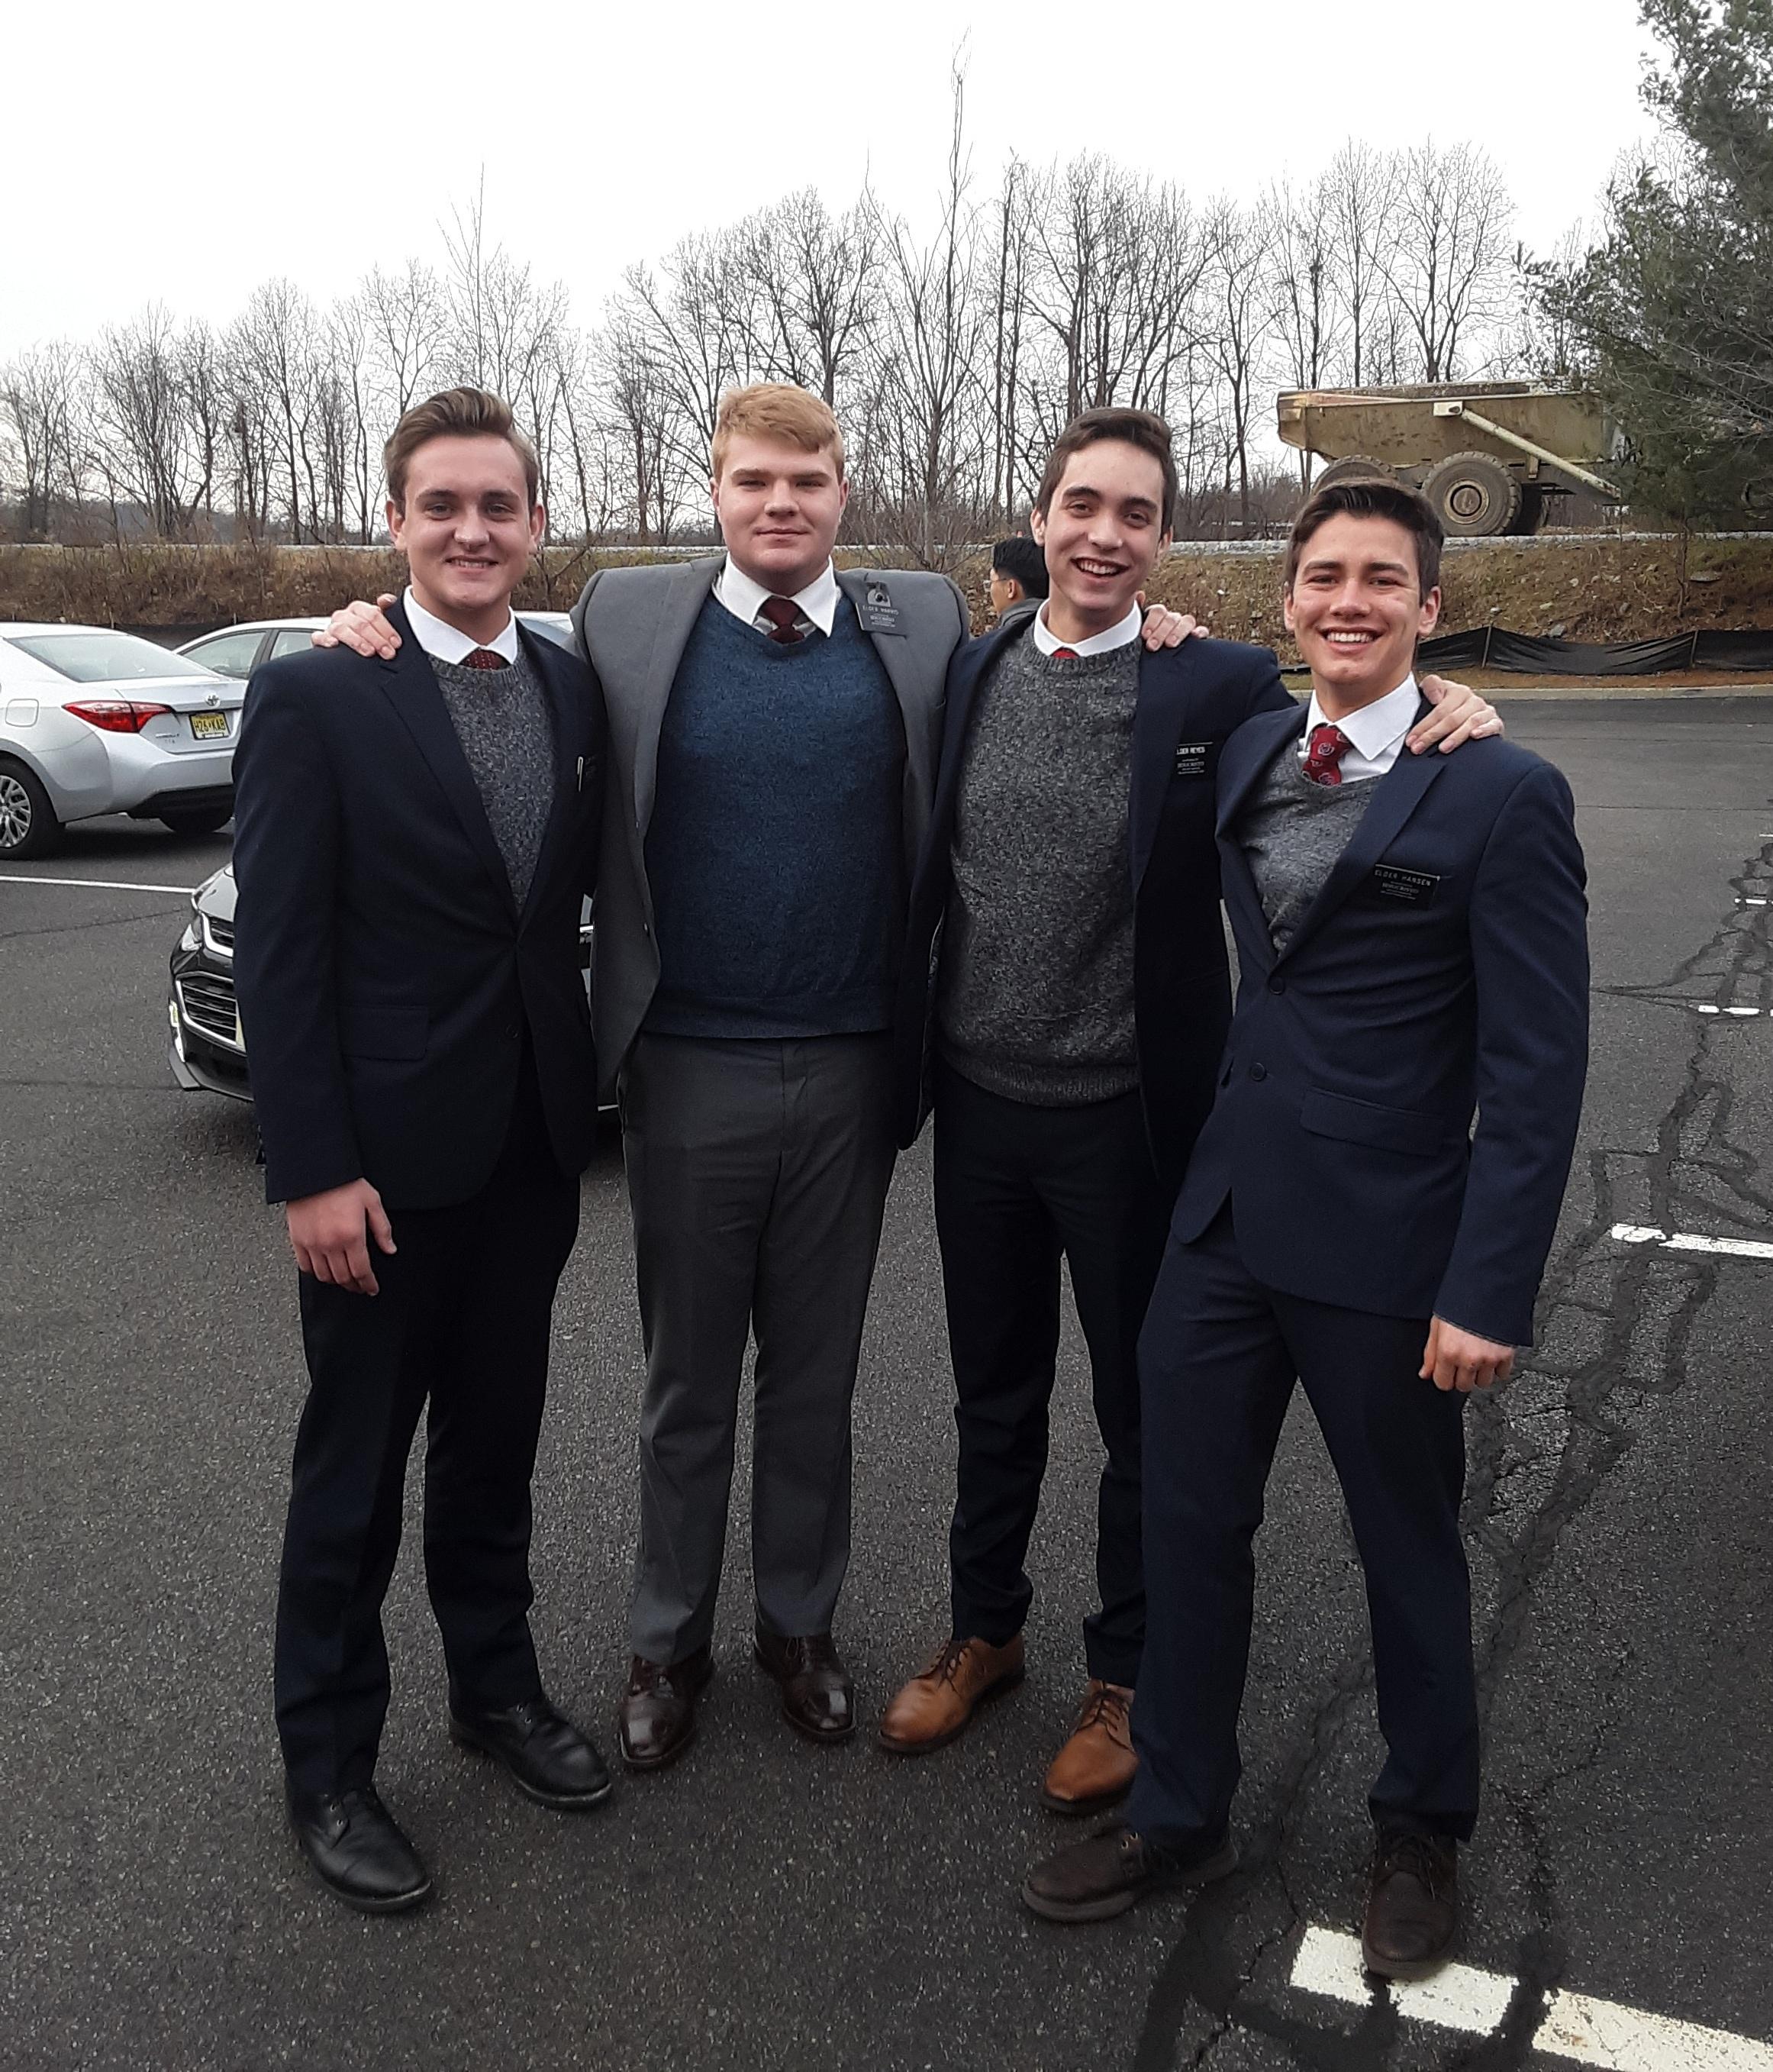 Elders Shields, Harris, Reyes and Hansen